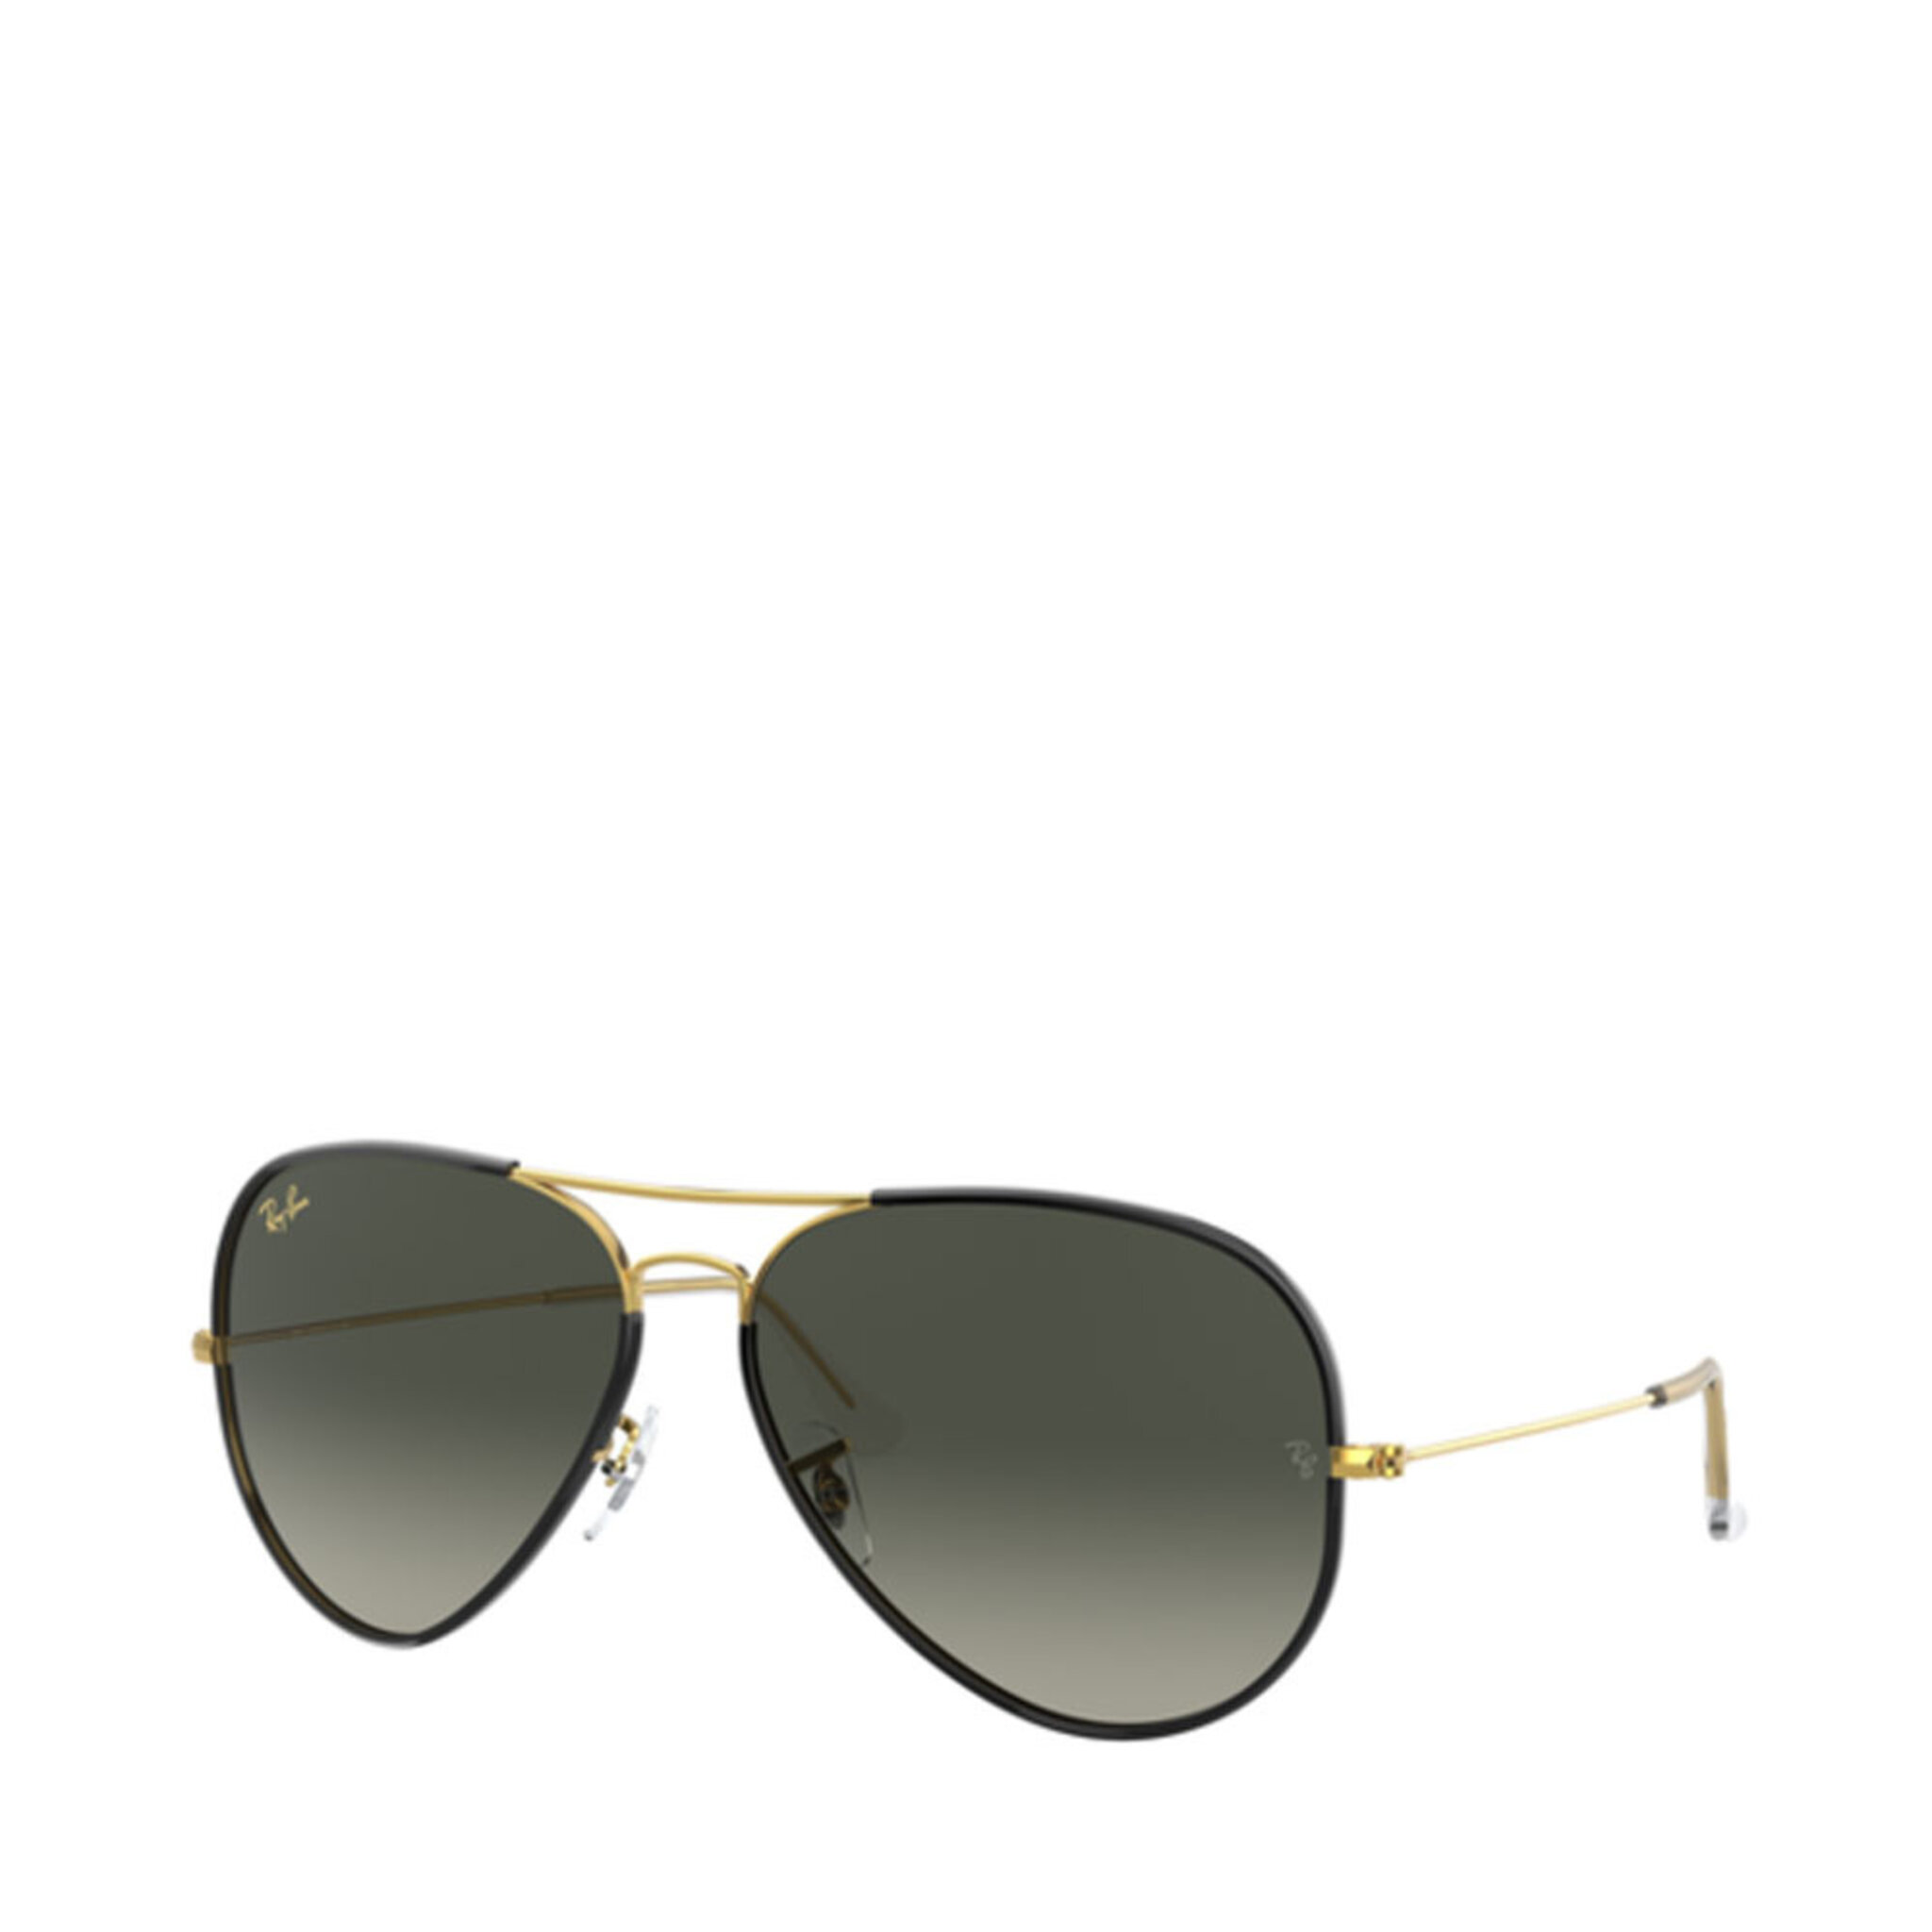 Sunglasses Icons, 58